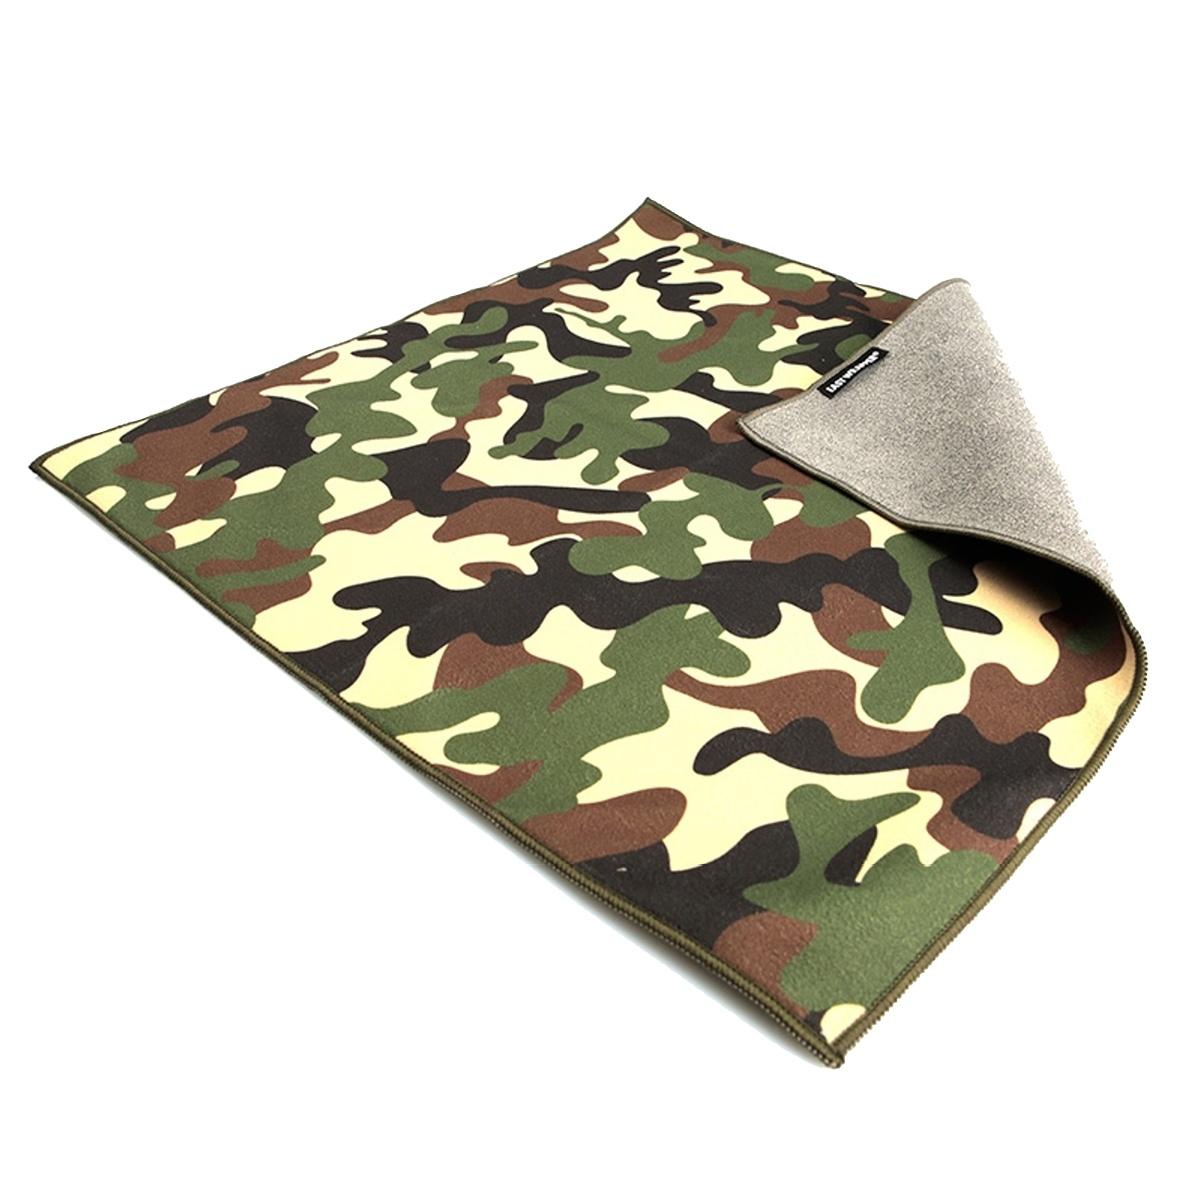 Einschlagtuch Easy Wrapper (S) Camouflage